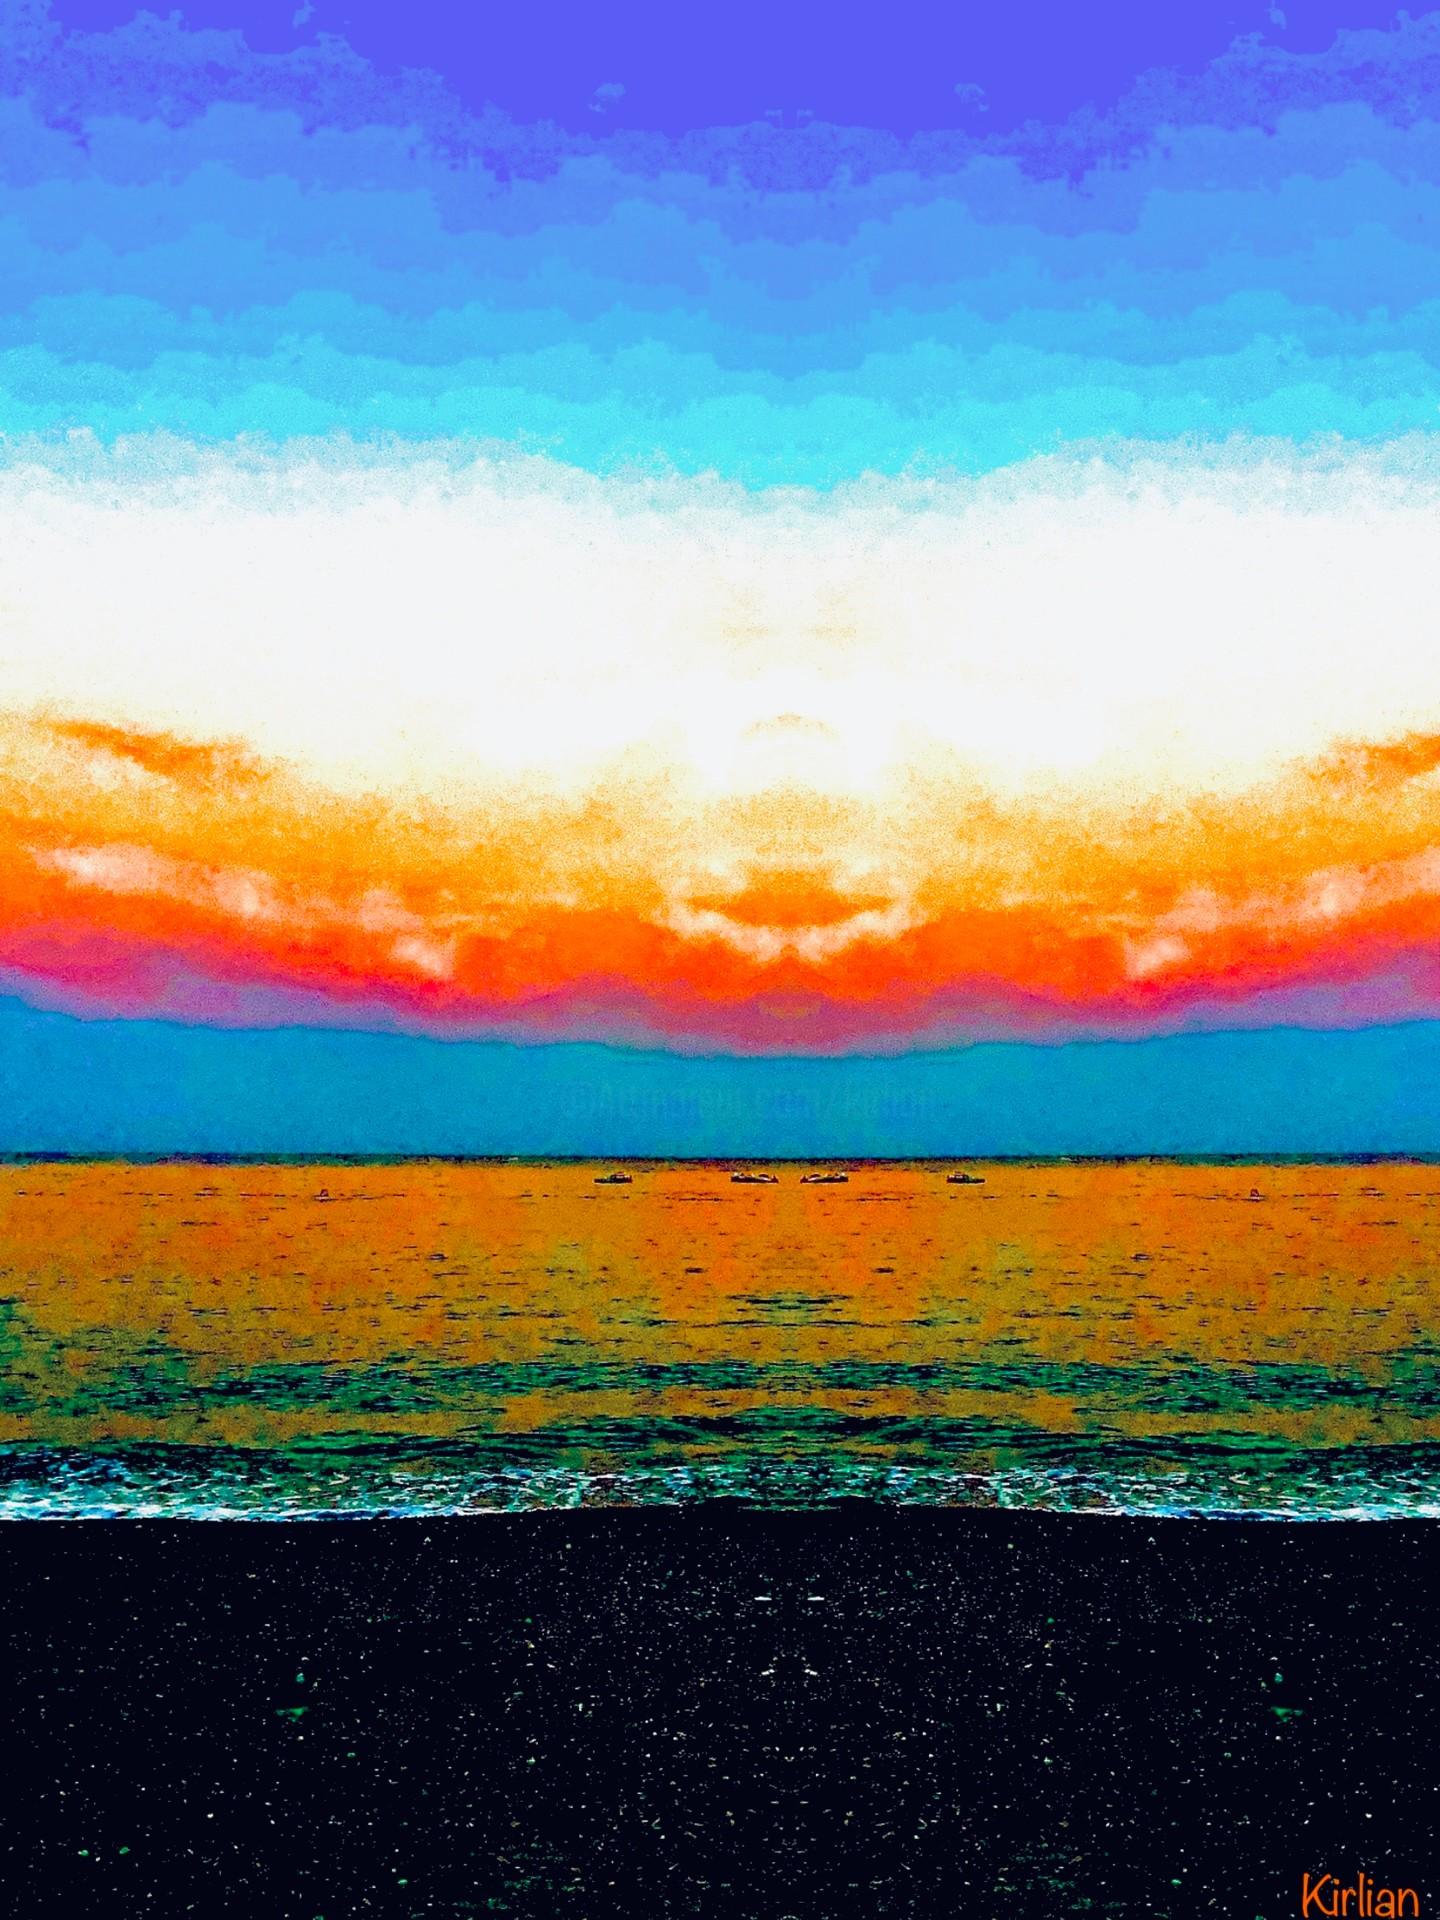 Kirlian - Love Creation